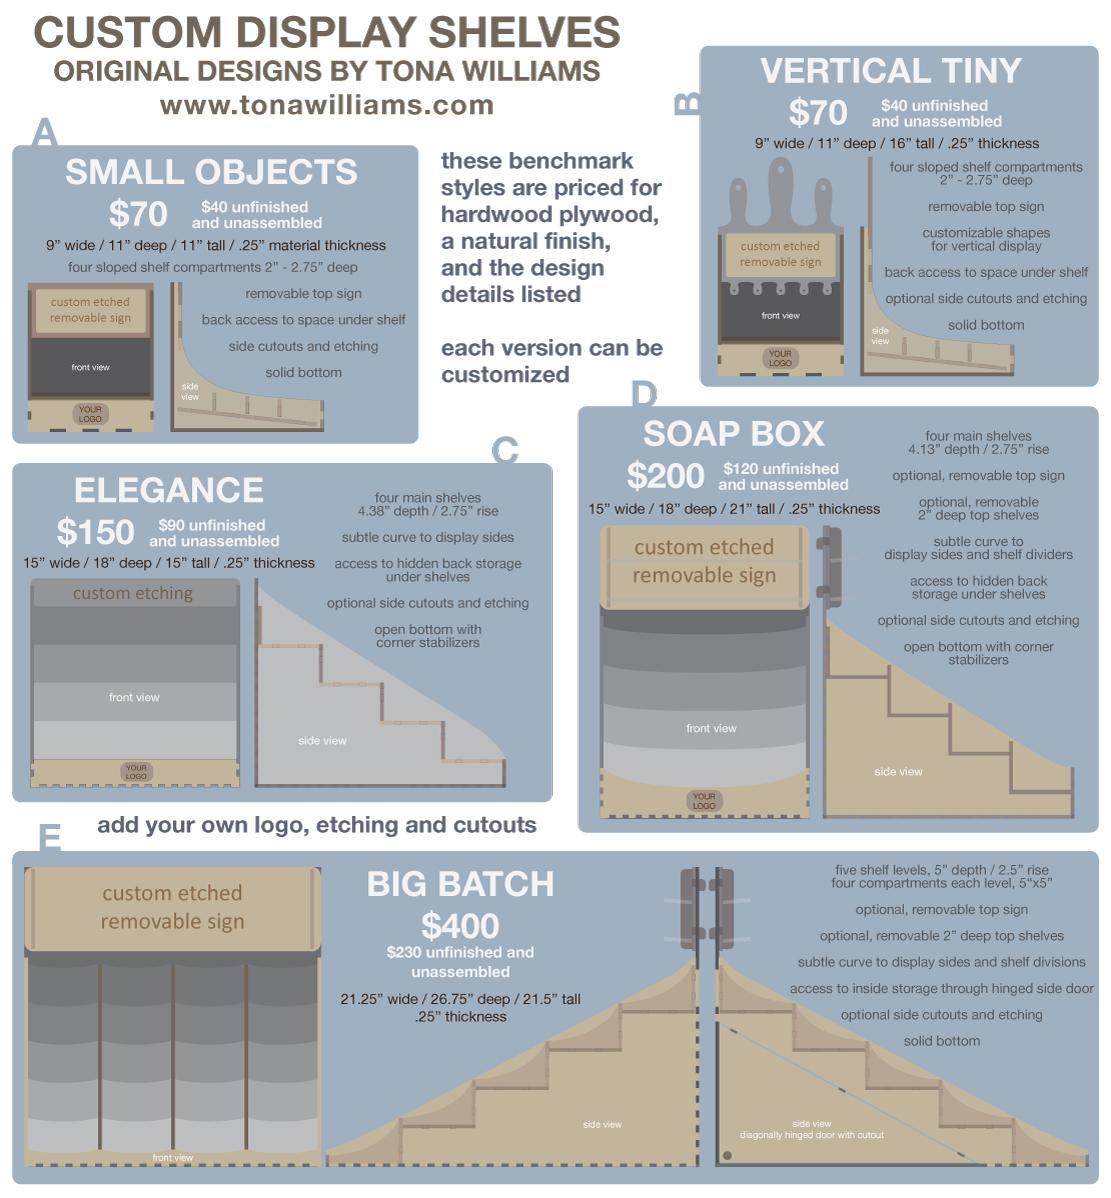 Custom display shelves by Tona Williams - spec sheet of options